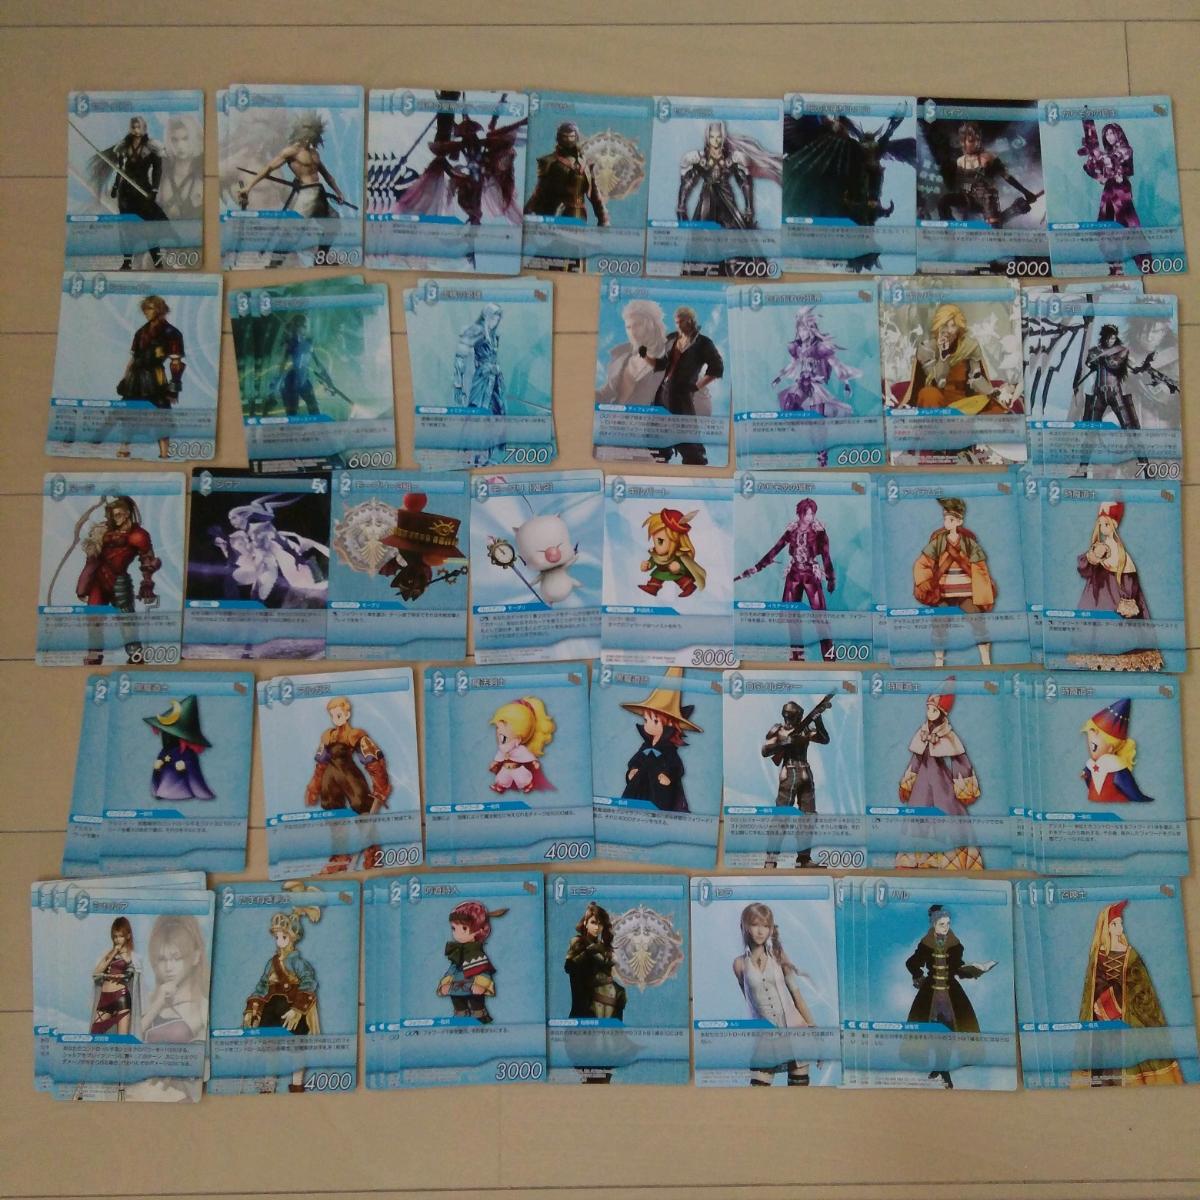 【FF TCG】ファイナルファンタジー トレーディングカードゲーム 337枚(ホロ9枚)スリーブケース 大量 まとめ売り マキナ ライトニング_画像6